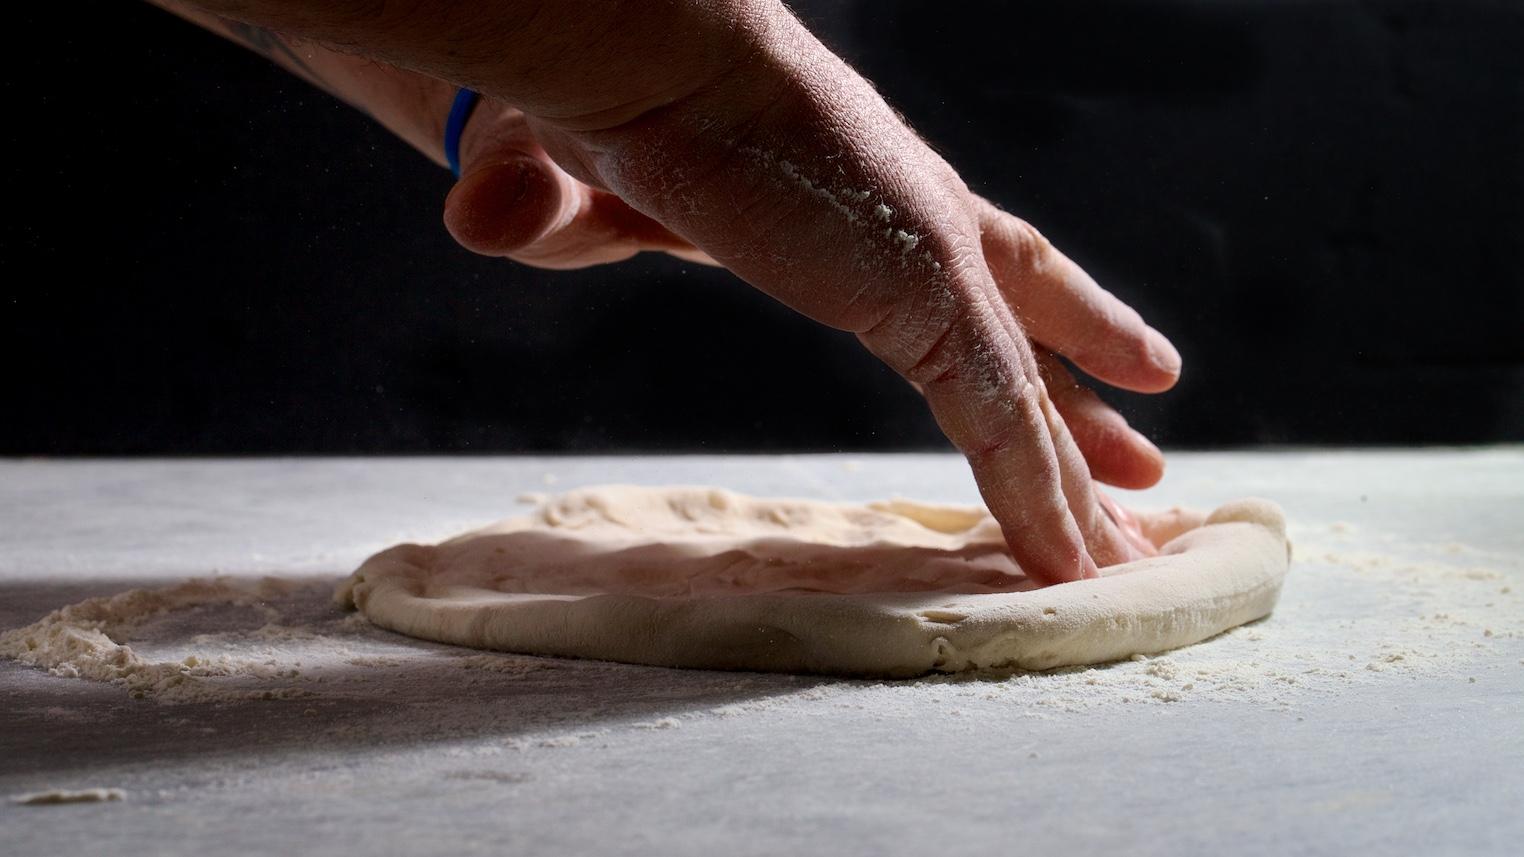 060-Pizzazzà-Nologo_IMG_9376